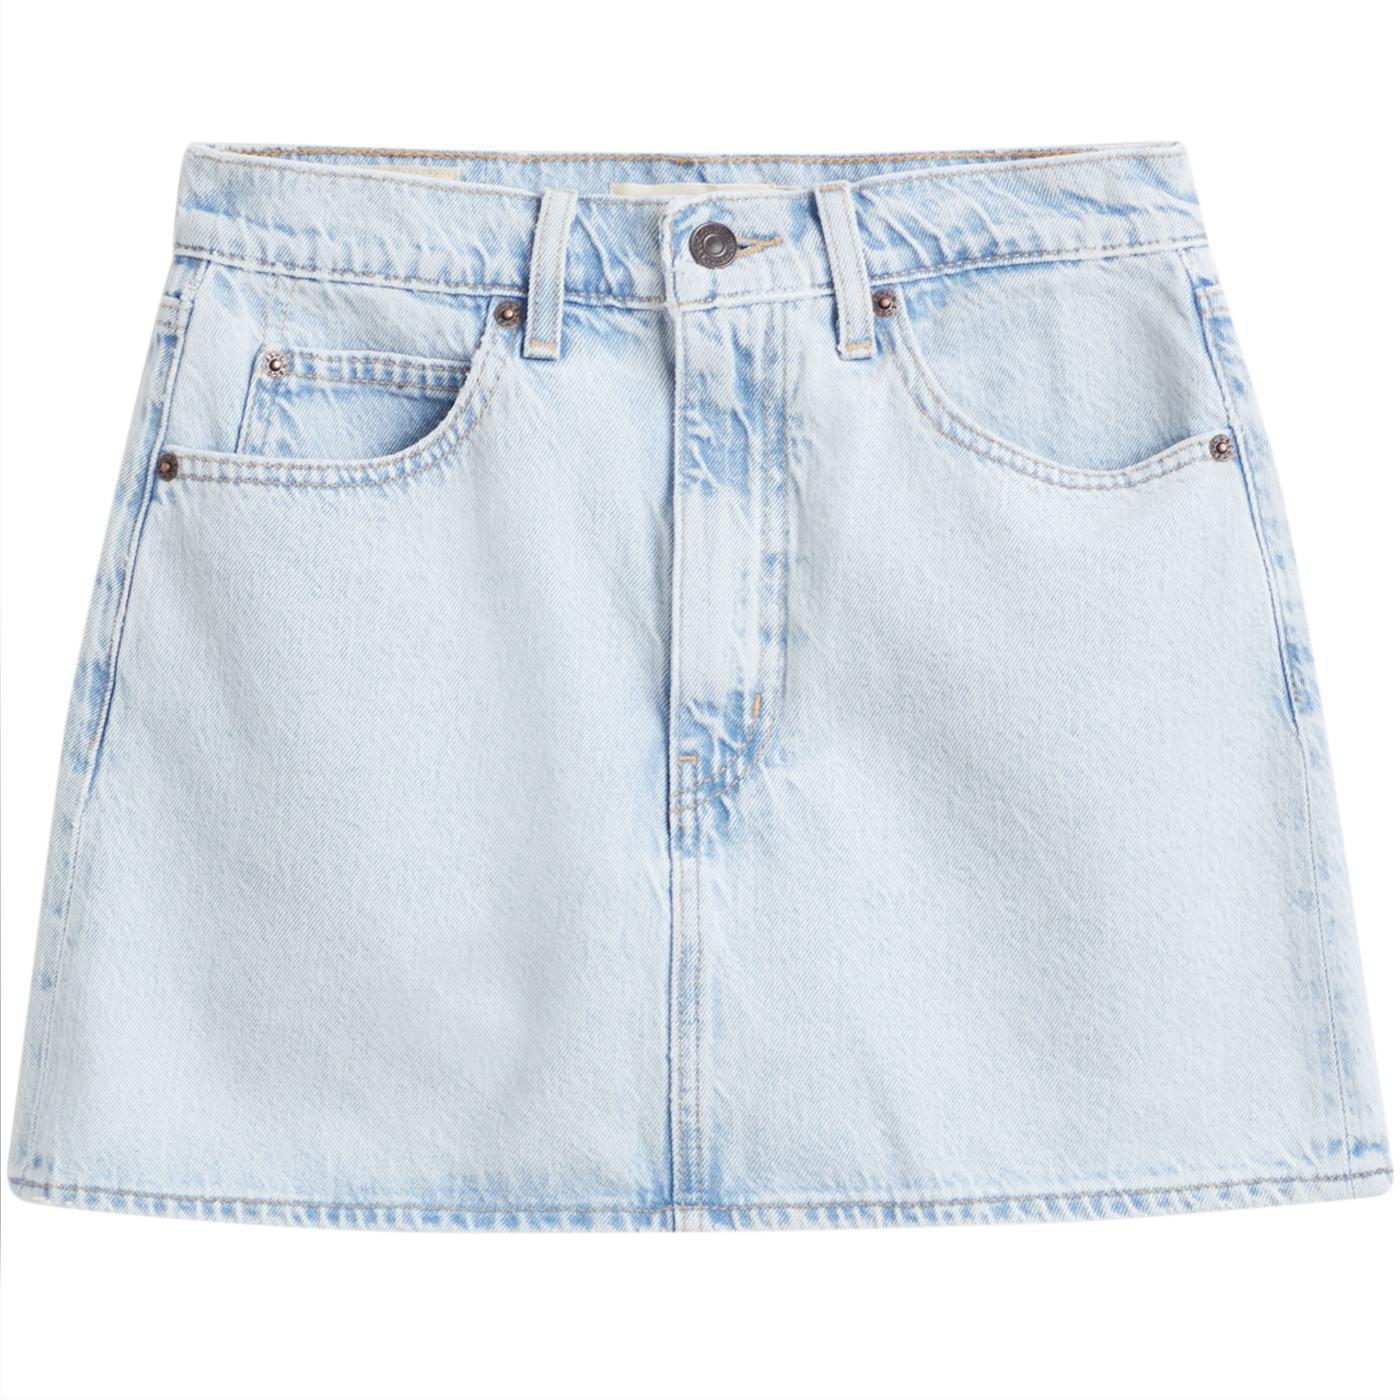 LEVI'S 70s High Retro Micro Mini Skirt HEY DARLING